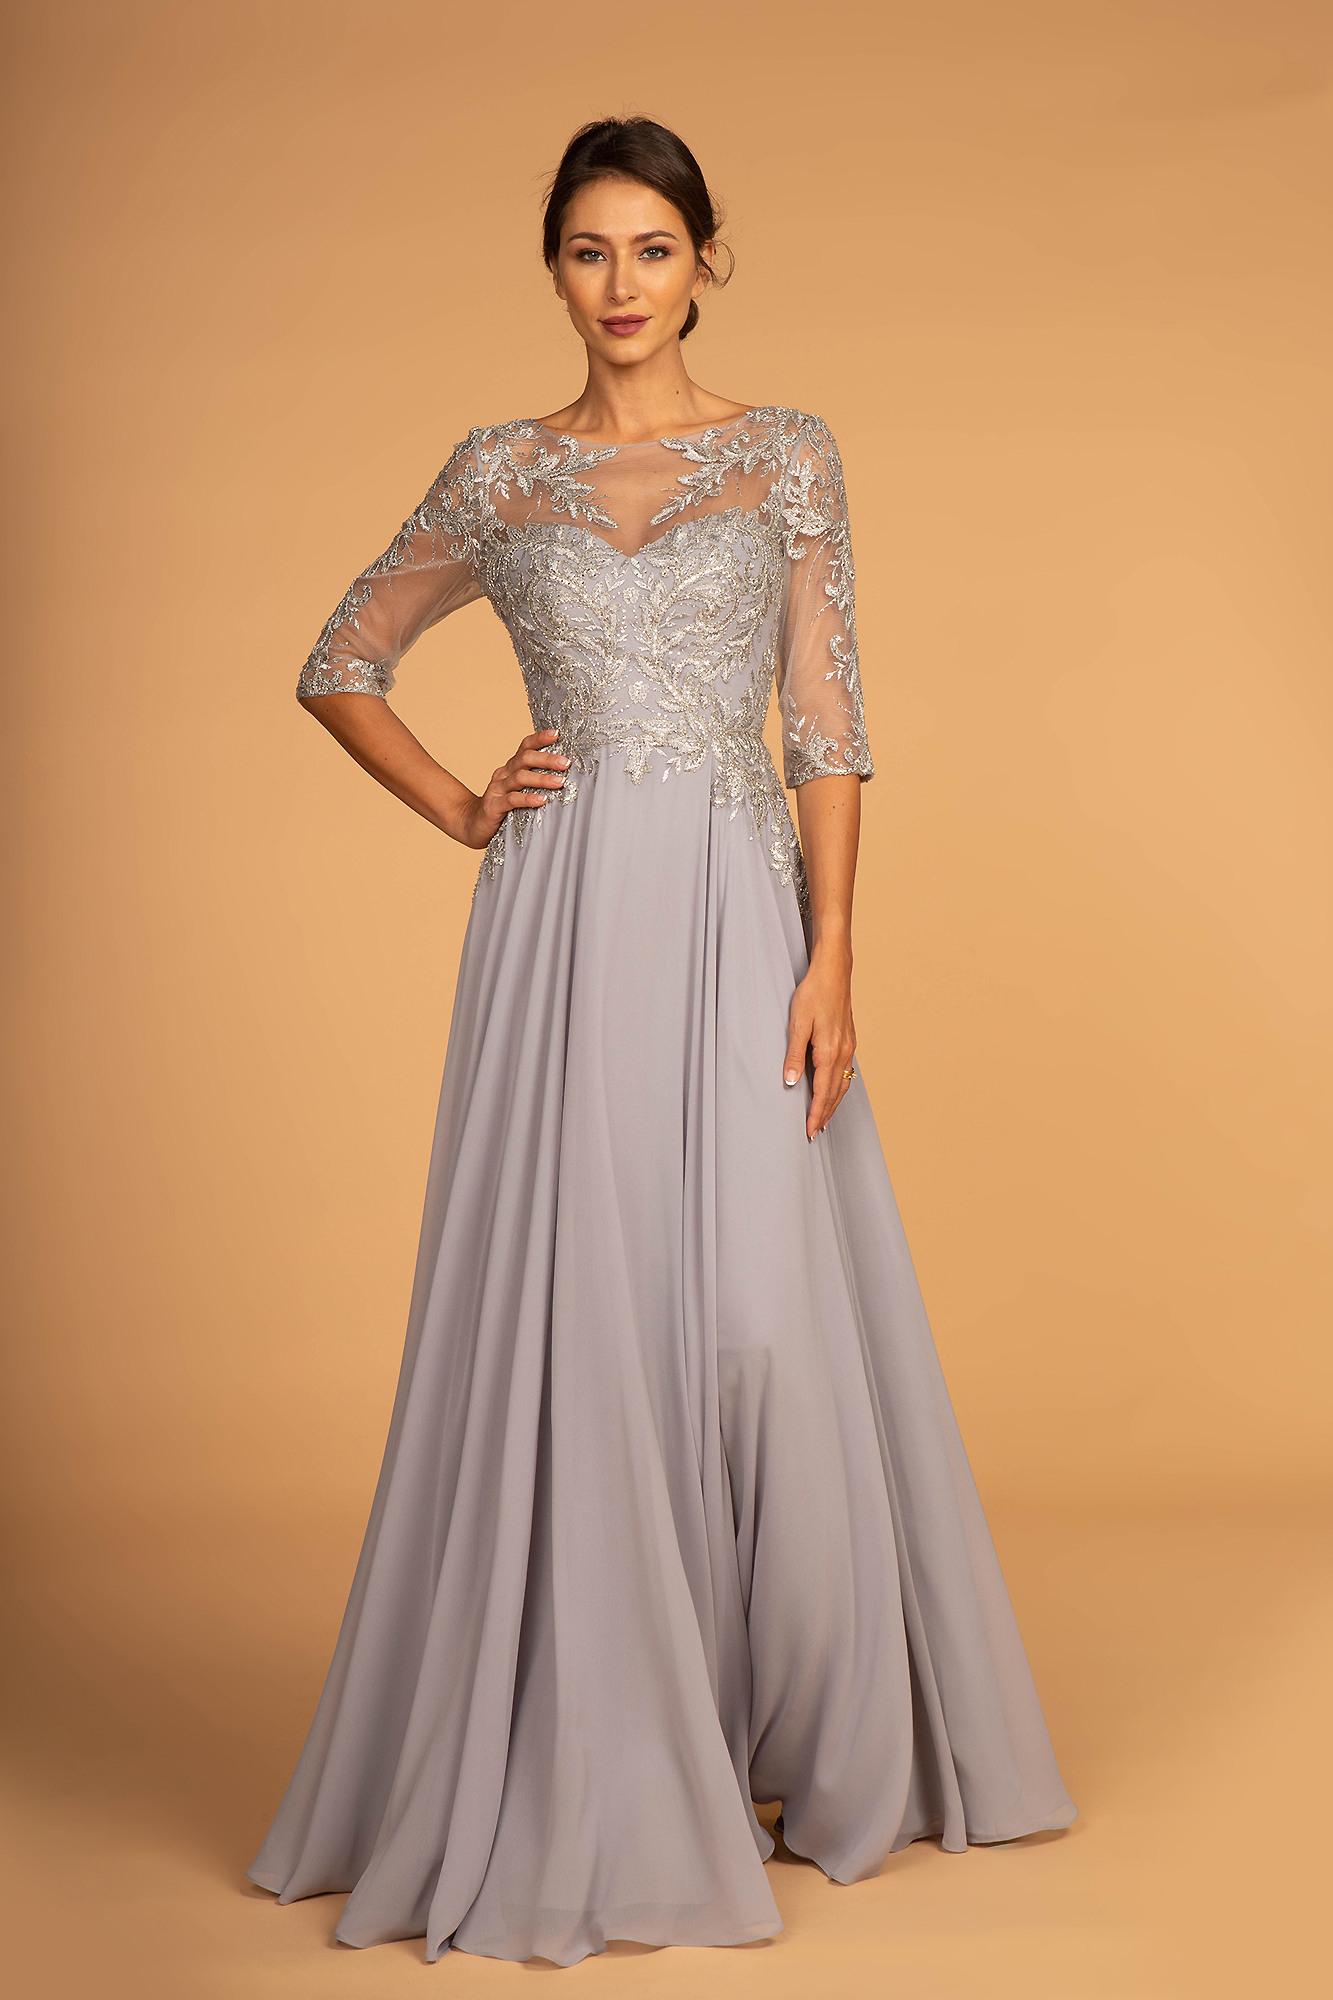 Elegante Ballkleid  Silberbraut  Tp Kleider